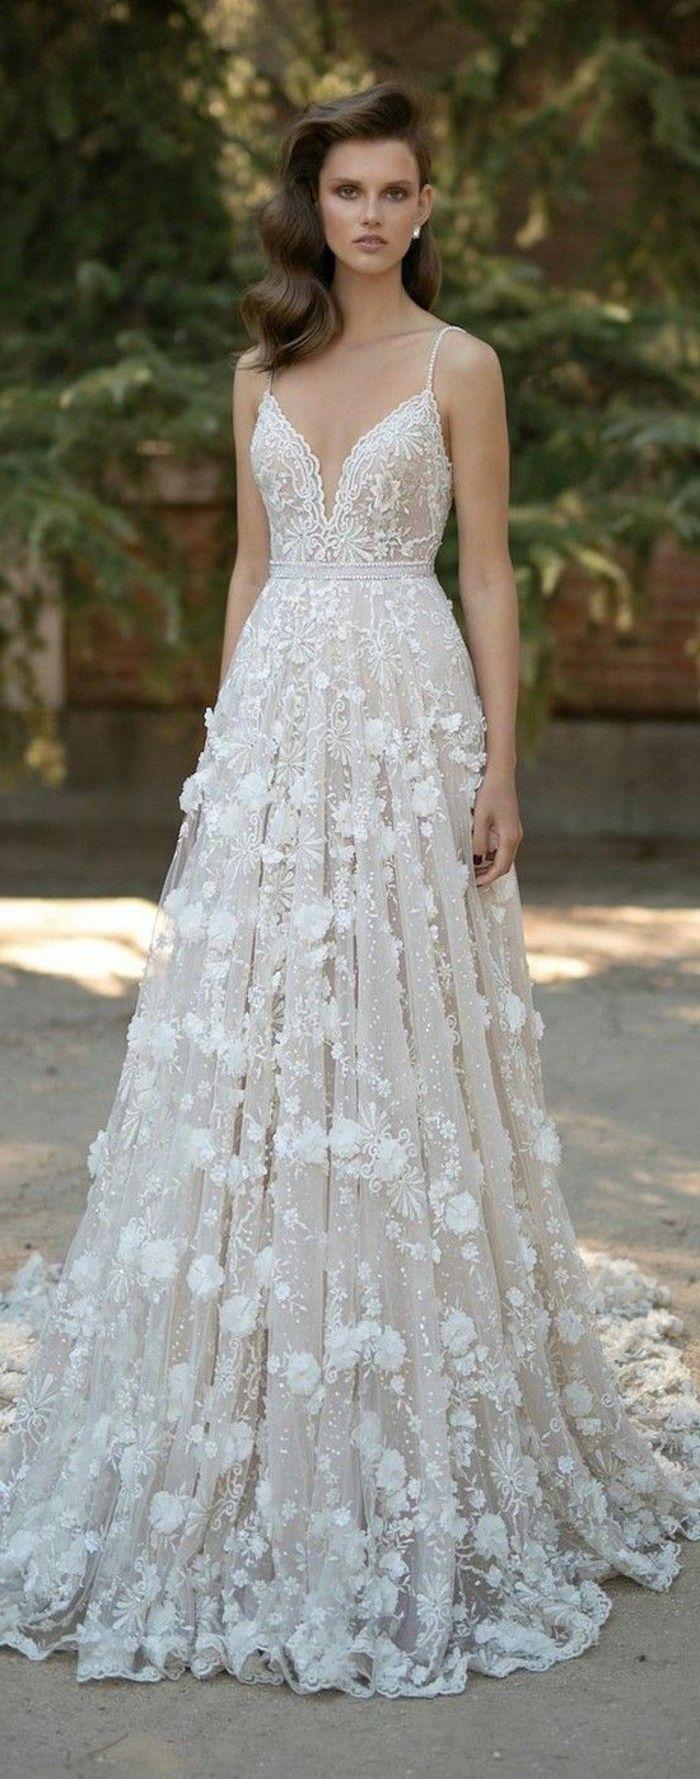 752 best Bröllopsklänning images on Pinterest | Short wedding gowns ...